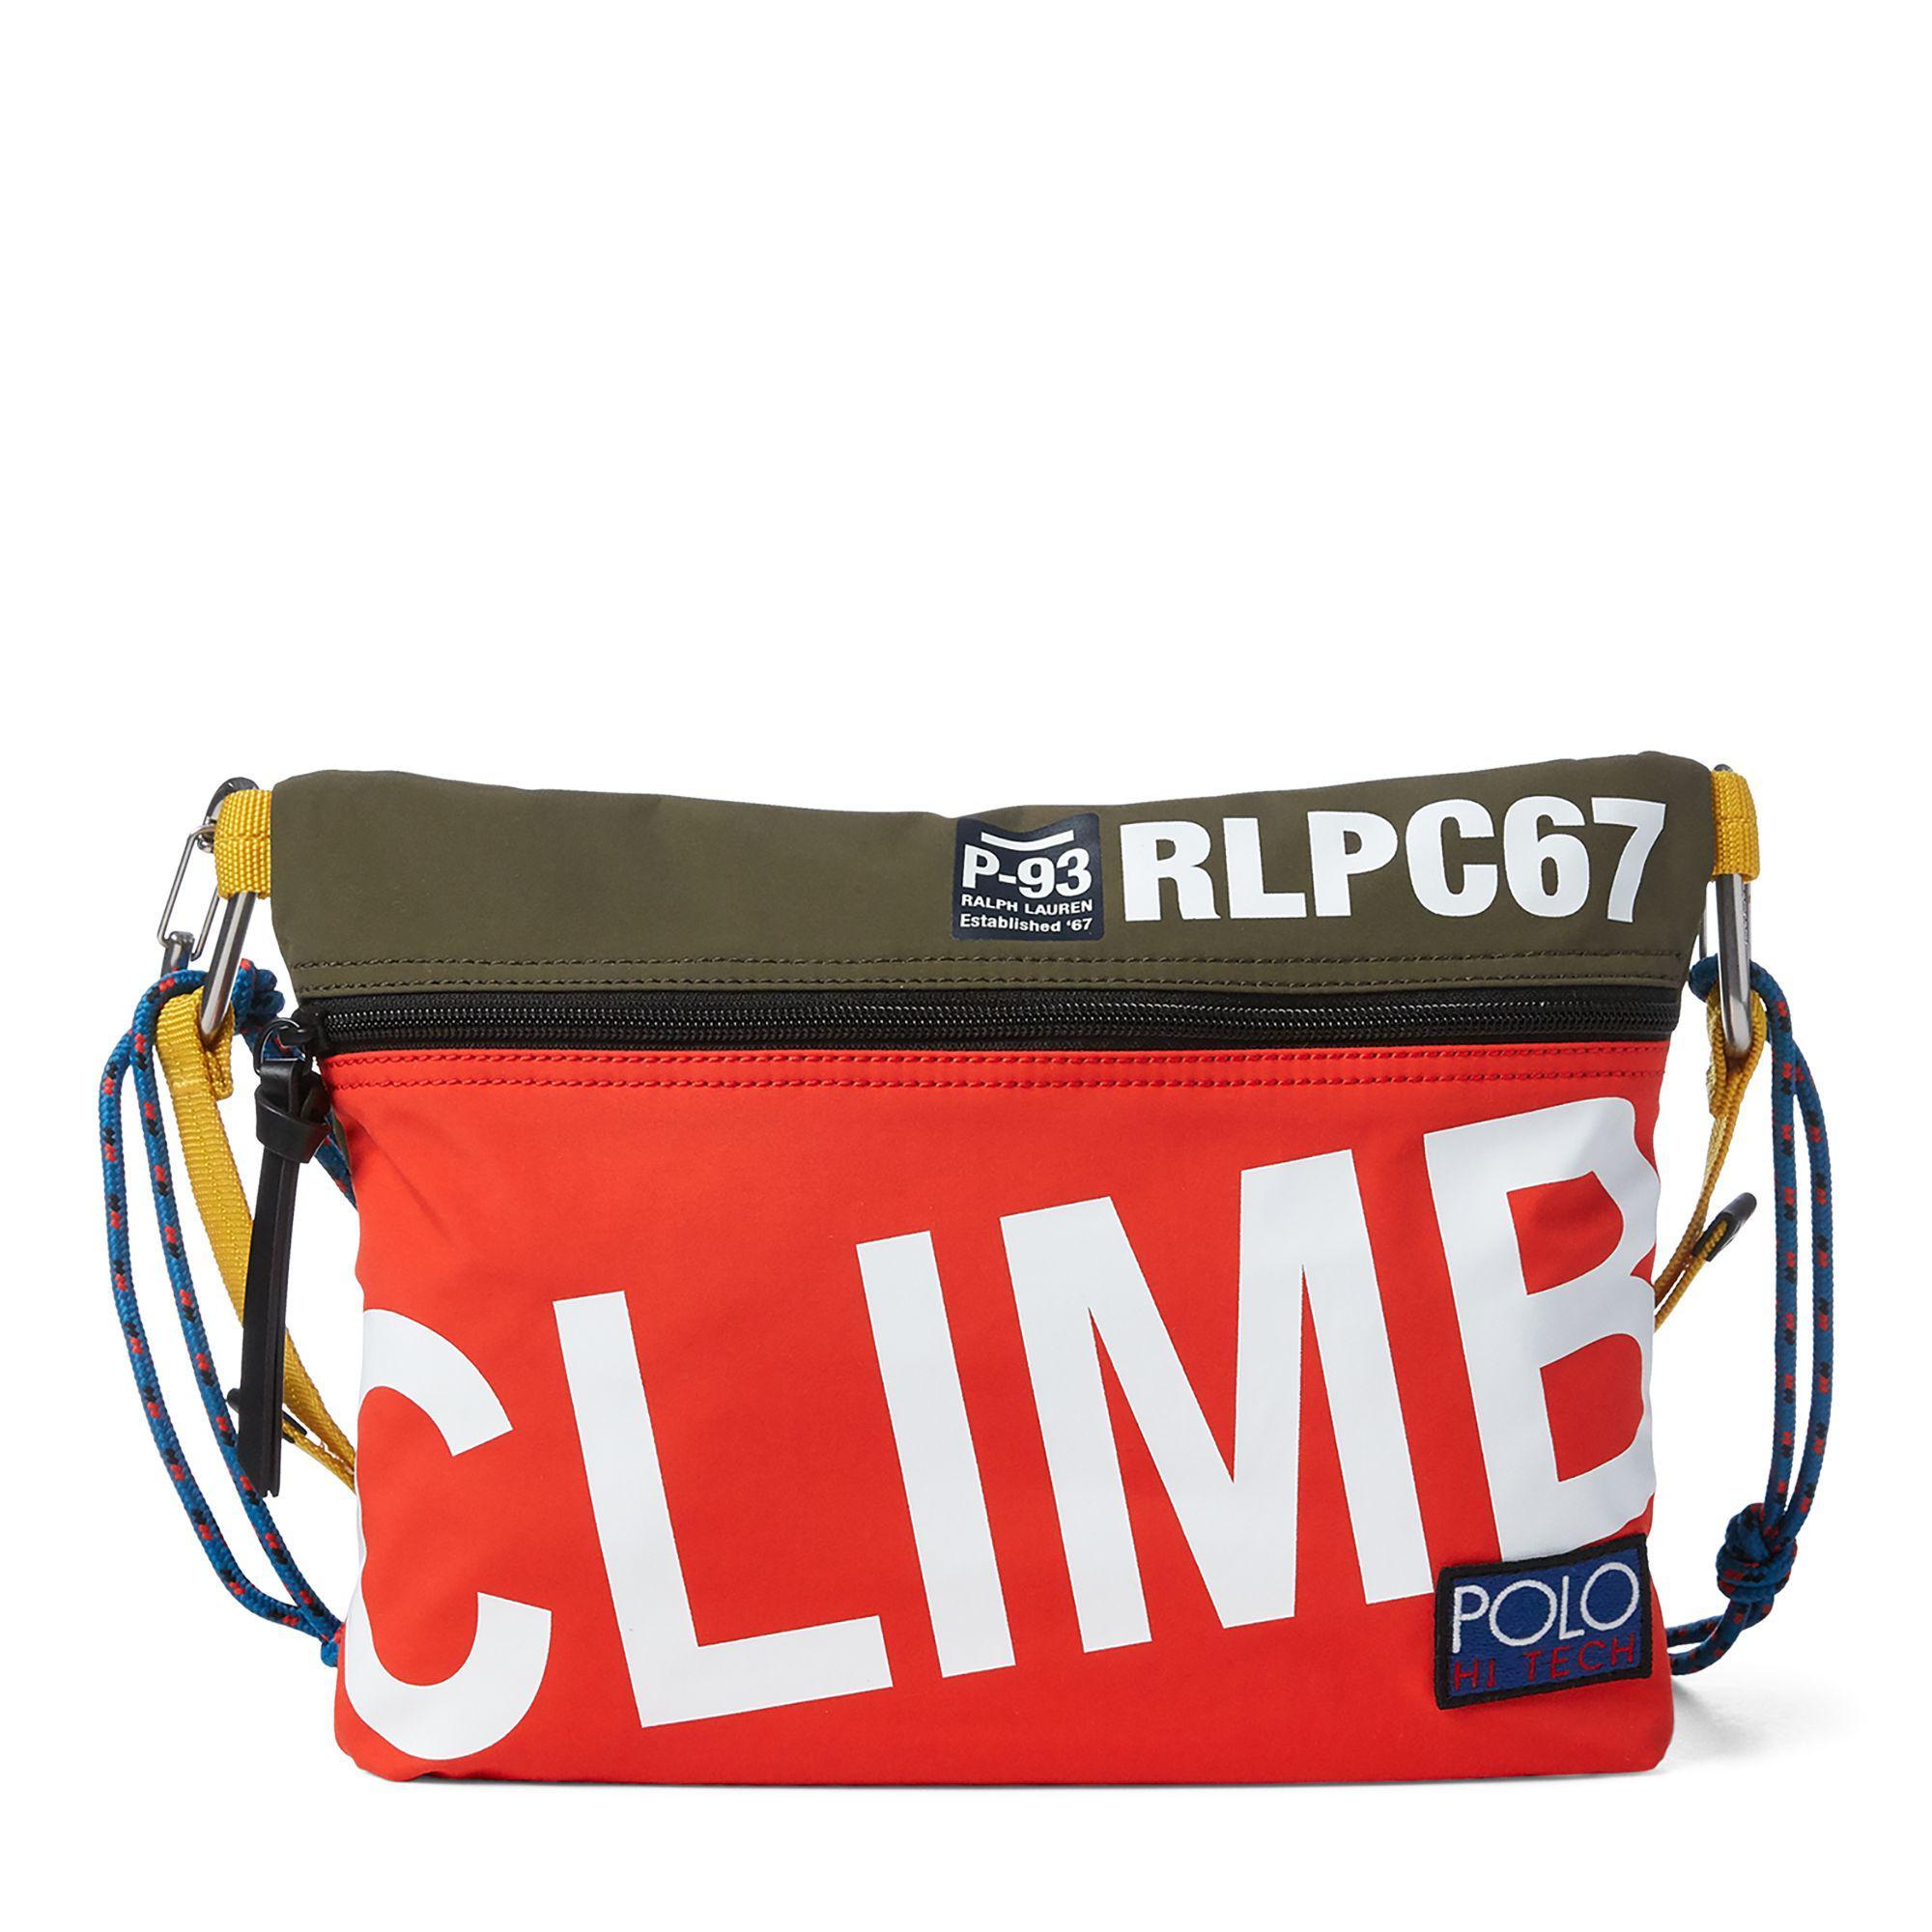 04fc0696aec1 Polo Ralph Lauren Climb Pouch for Men - Lyst